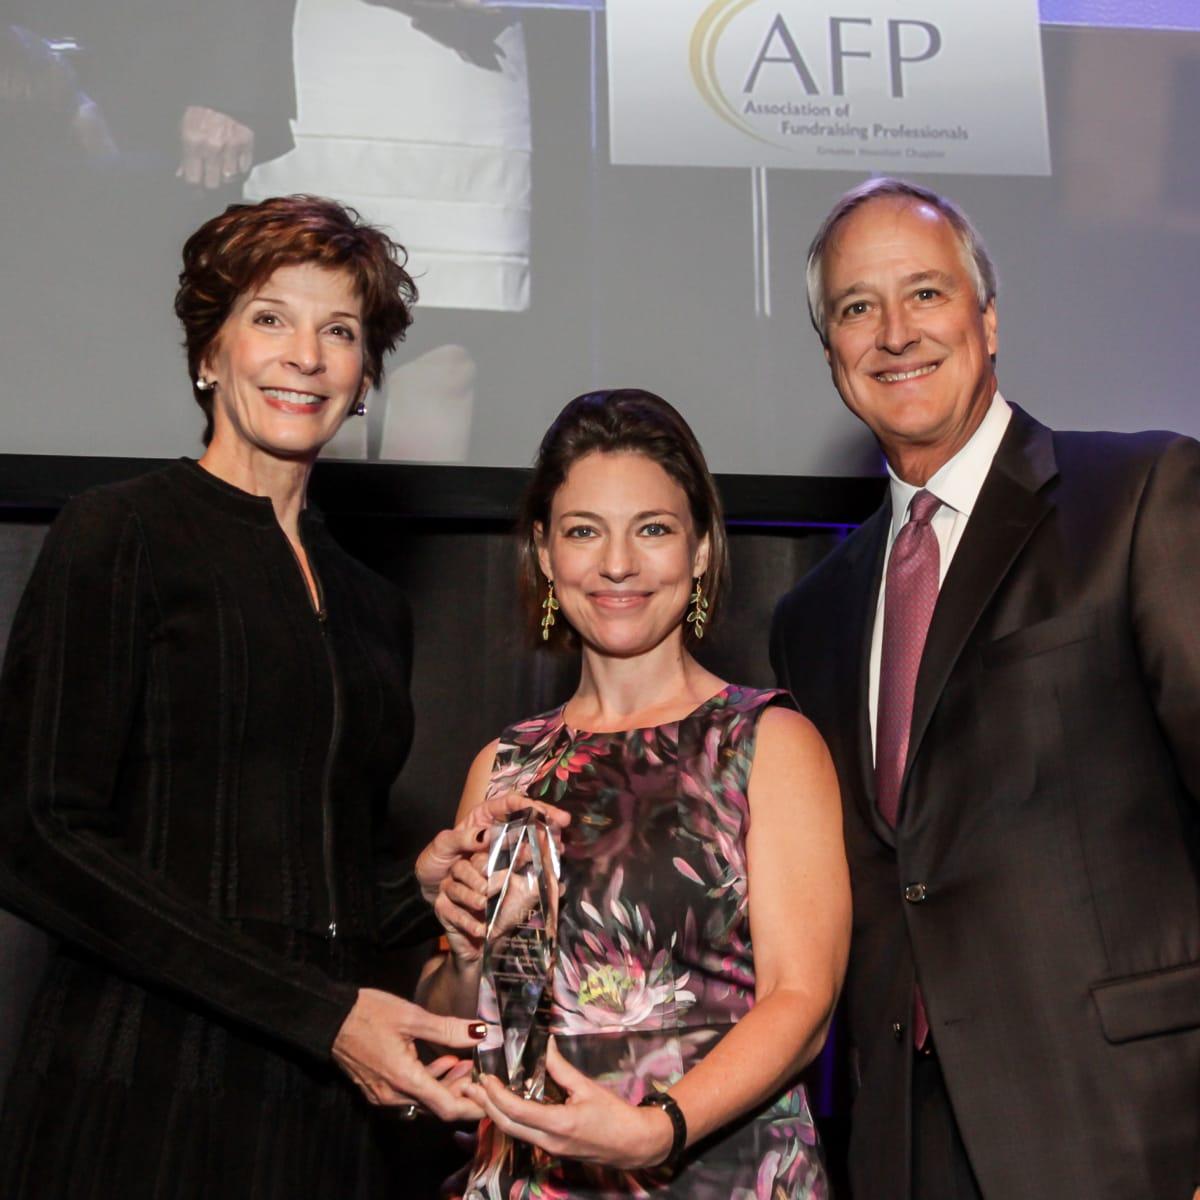 News, National Philanthropy Day Awards, Dec. 2015, Mary Williams, Cullen Geiselman, Will Williams